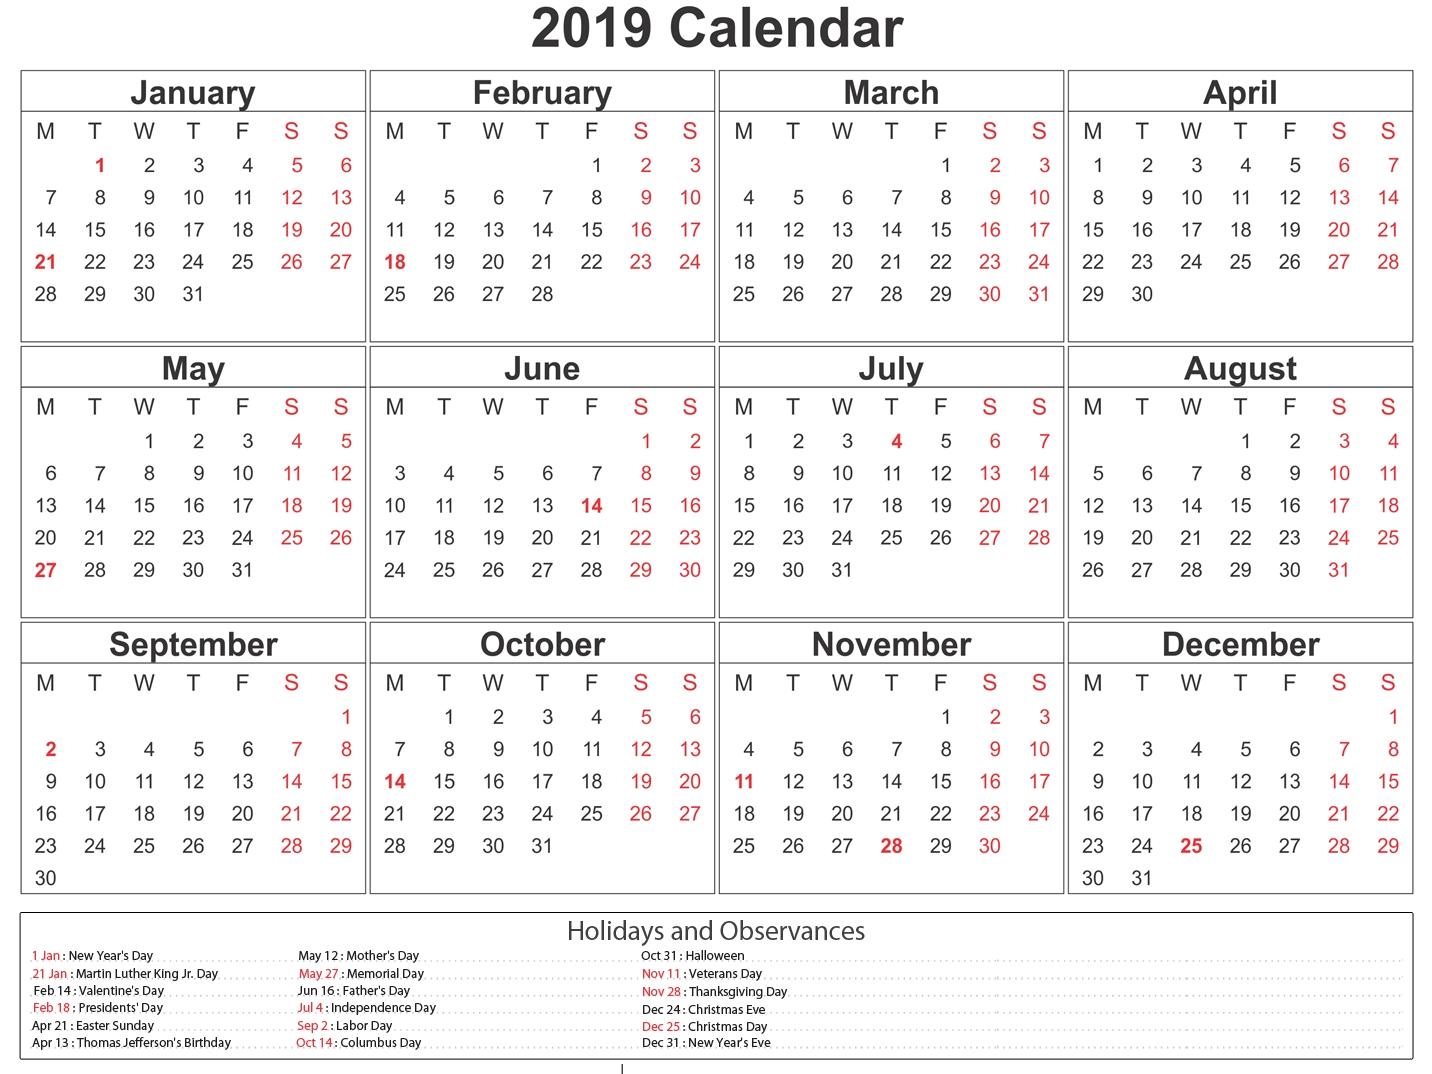 Printable South Africa 2019 Calendar #southafrica #calendar Printable Desk Calender South Africa